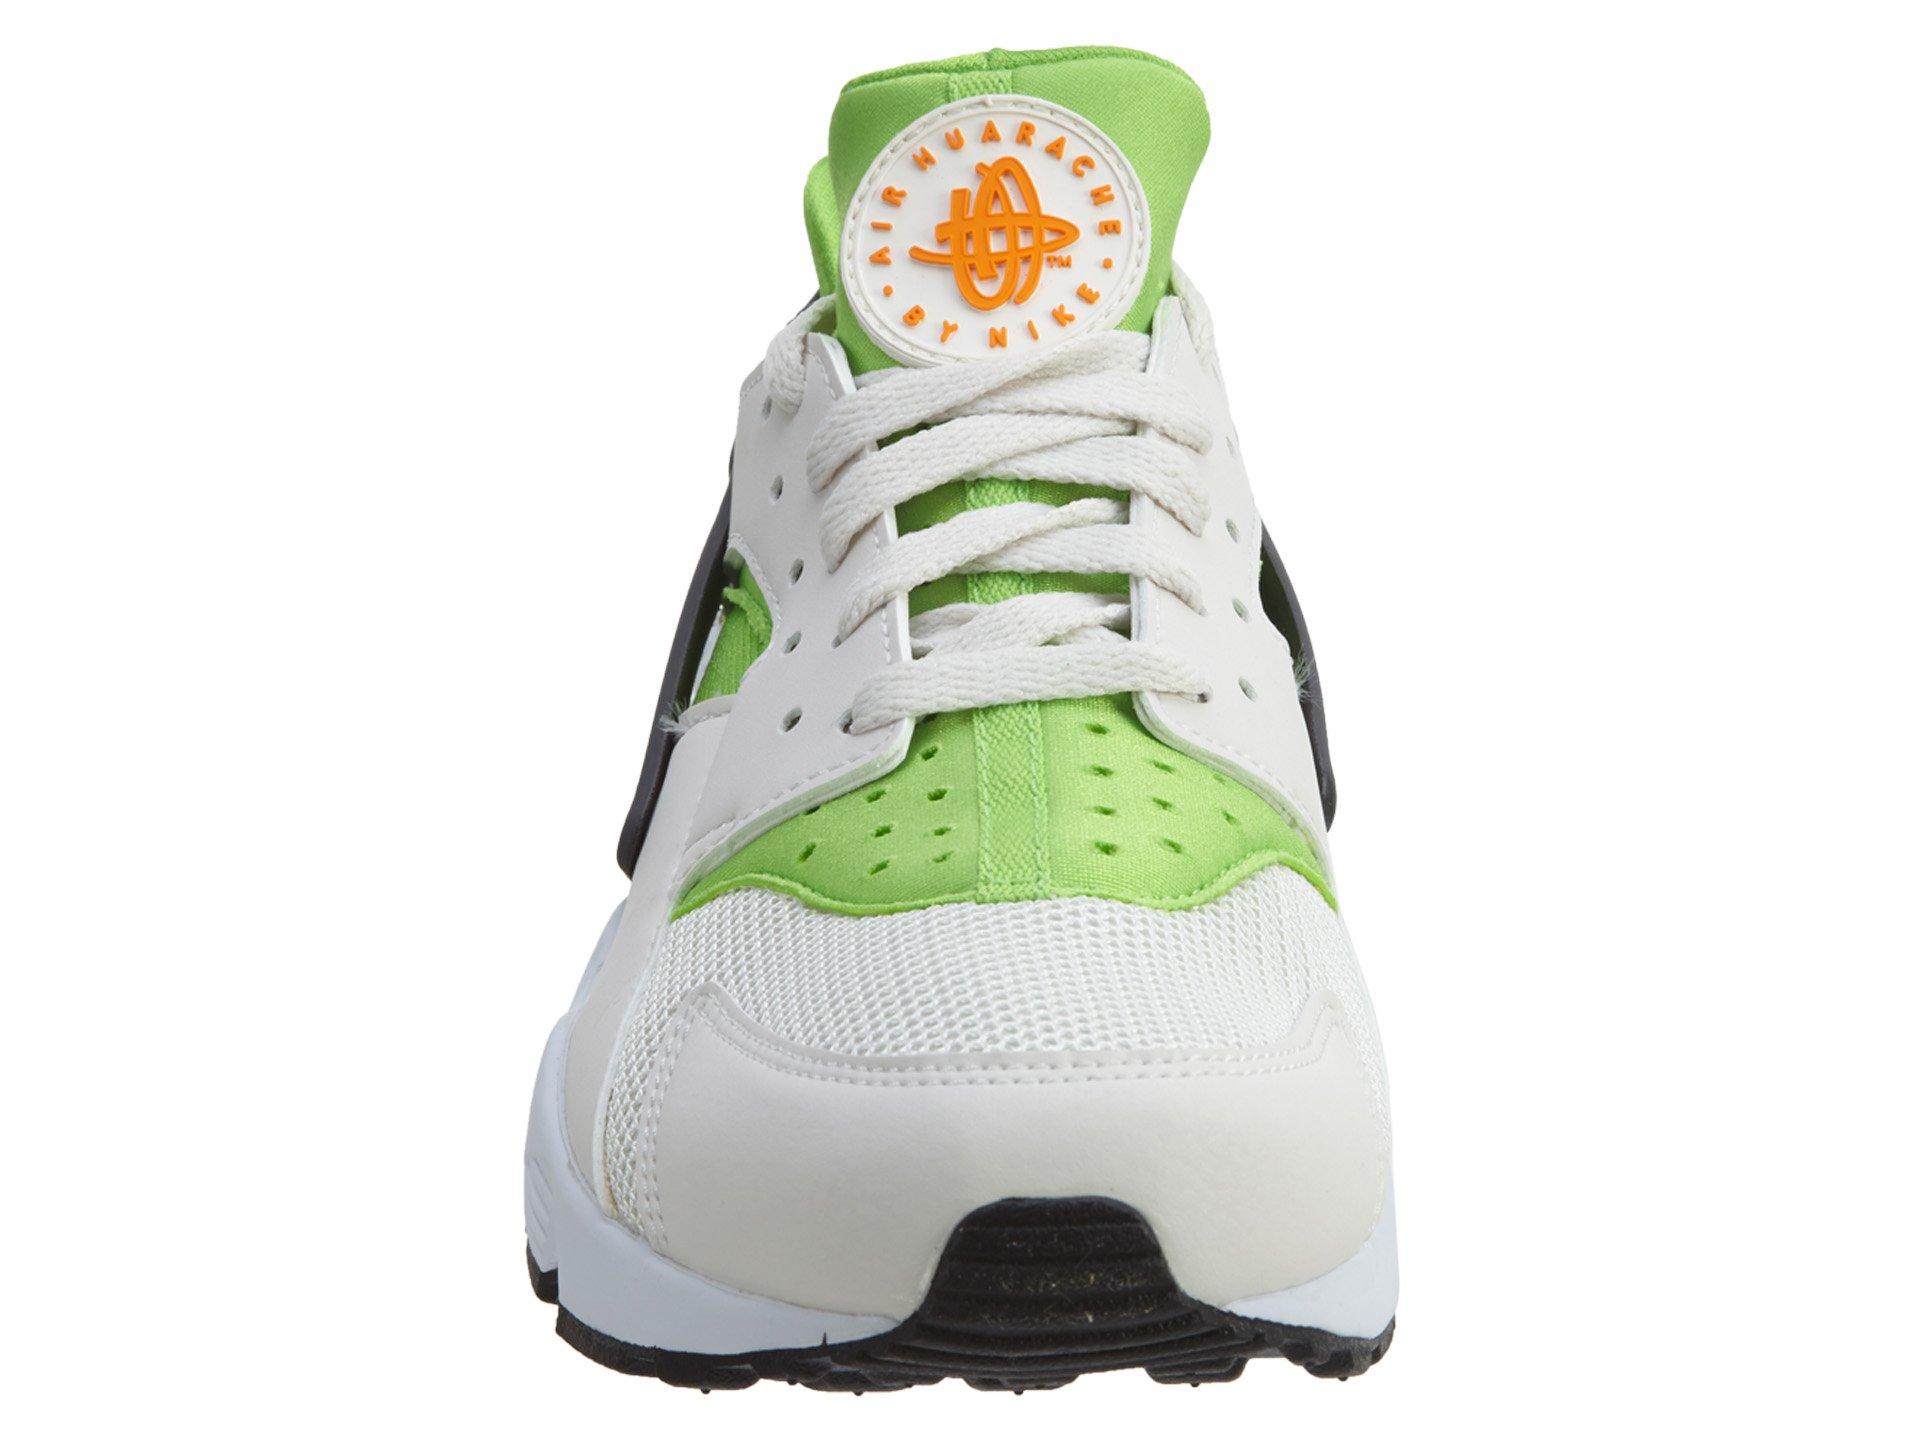 Nike Men's Air Huarache Actn Green/Vvd Orng Phntm Wht Running Shoe 10.5 Men US by NIKE (Image #5)